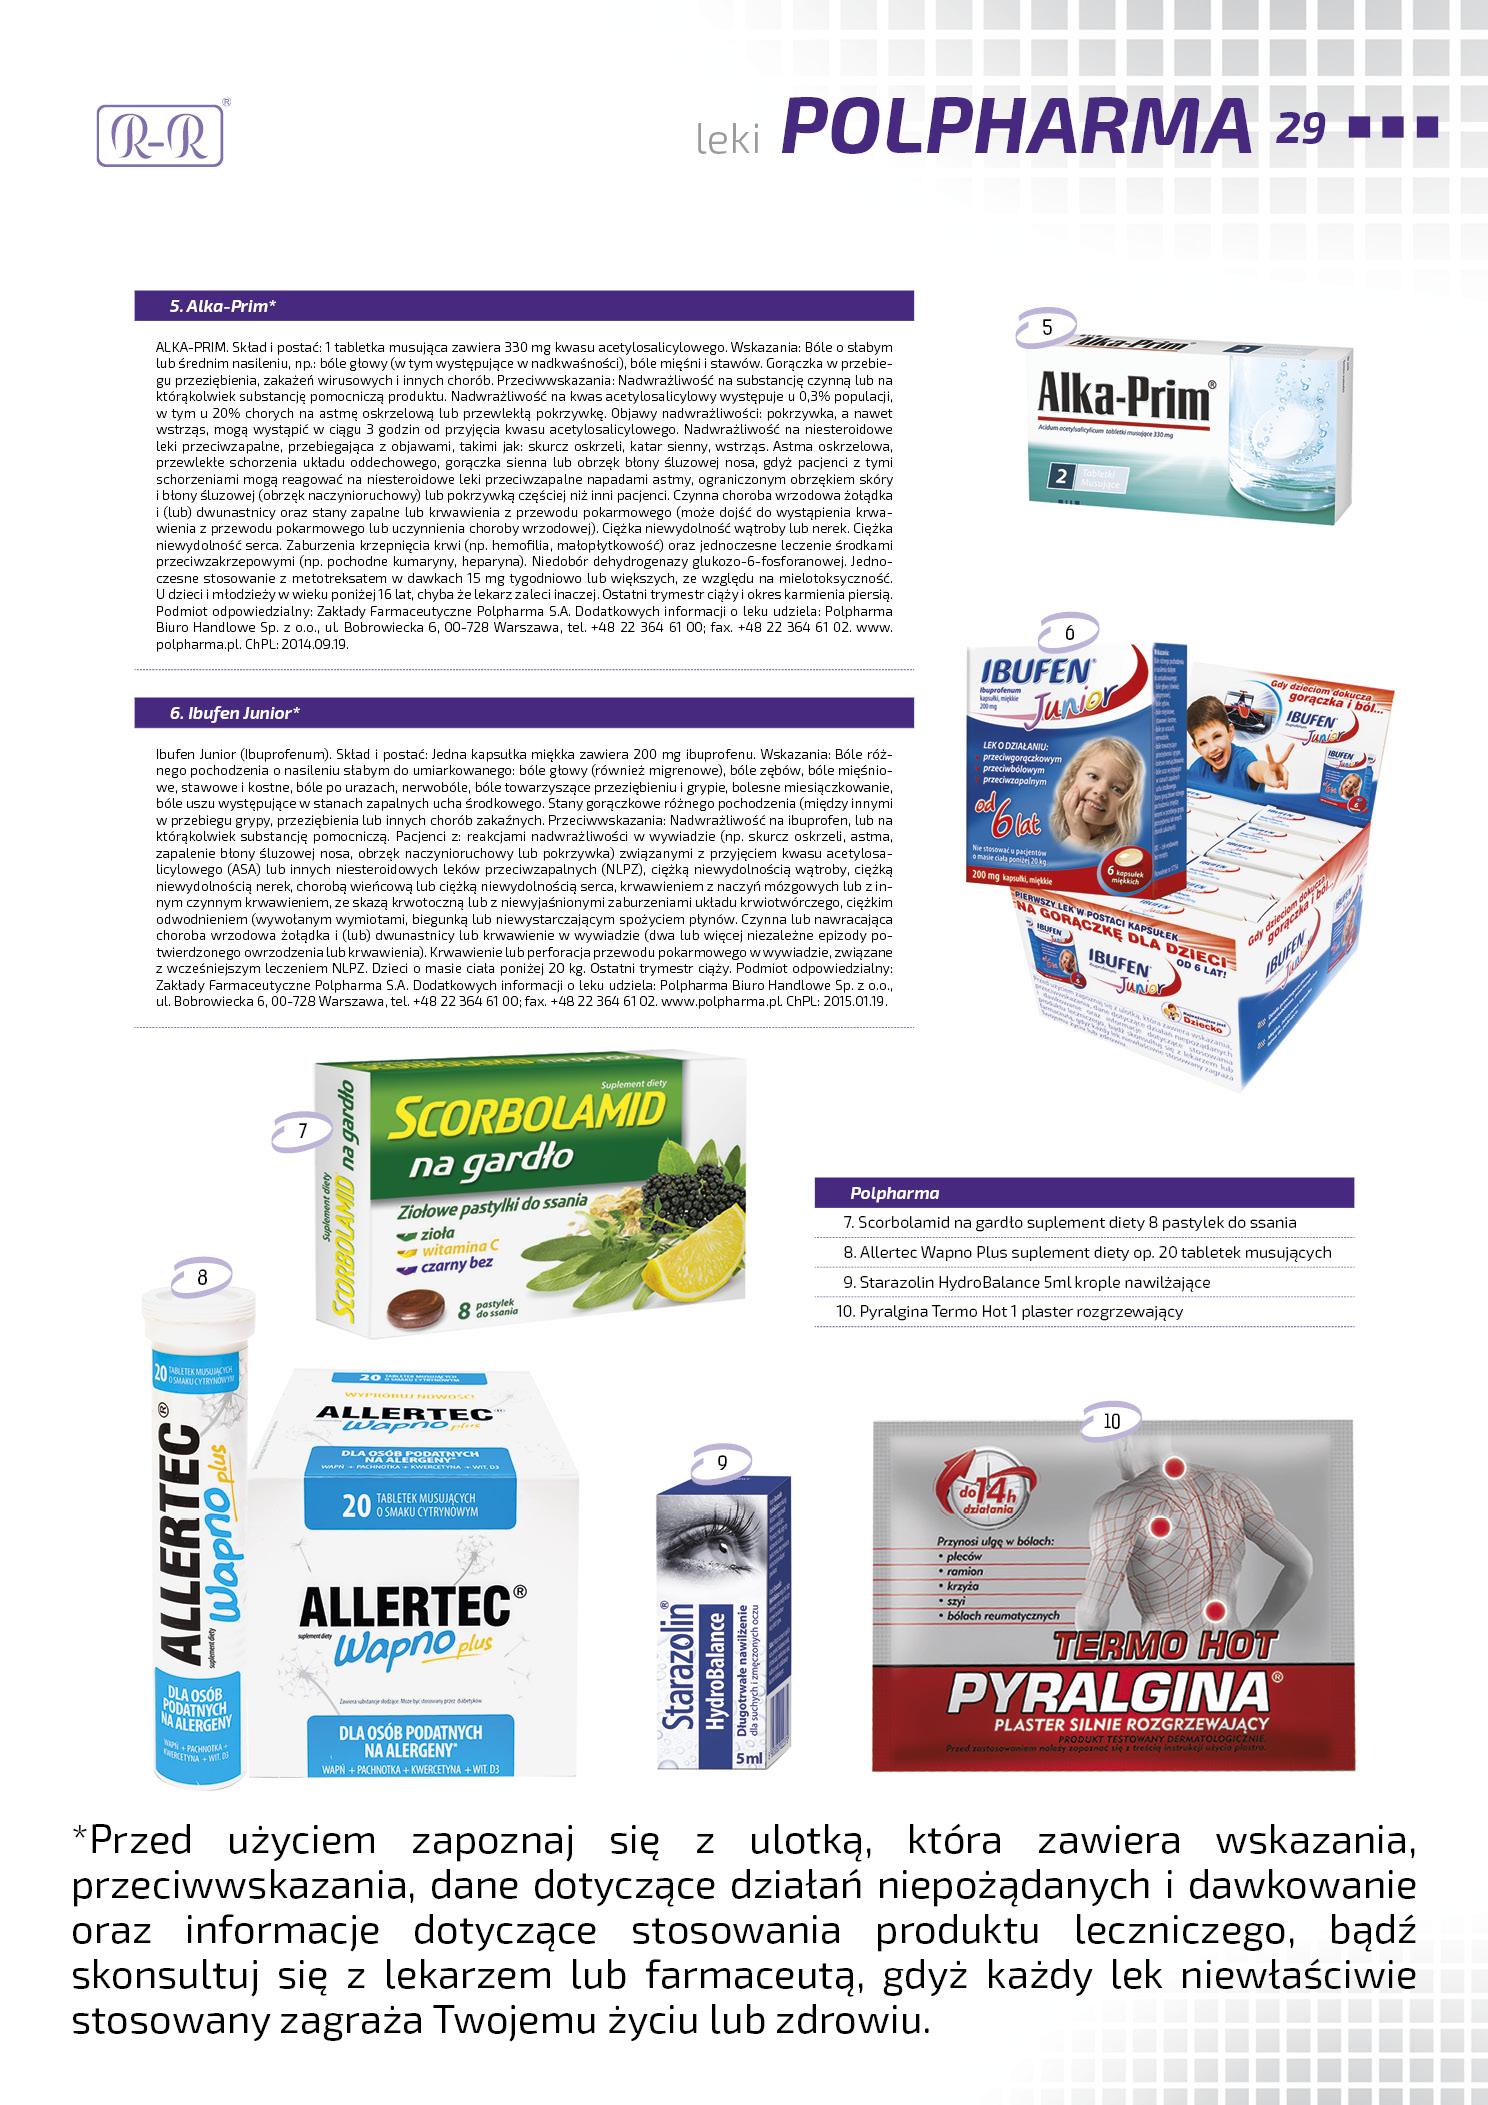 Tabletki Polpharma